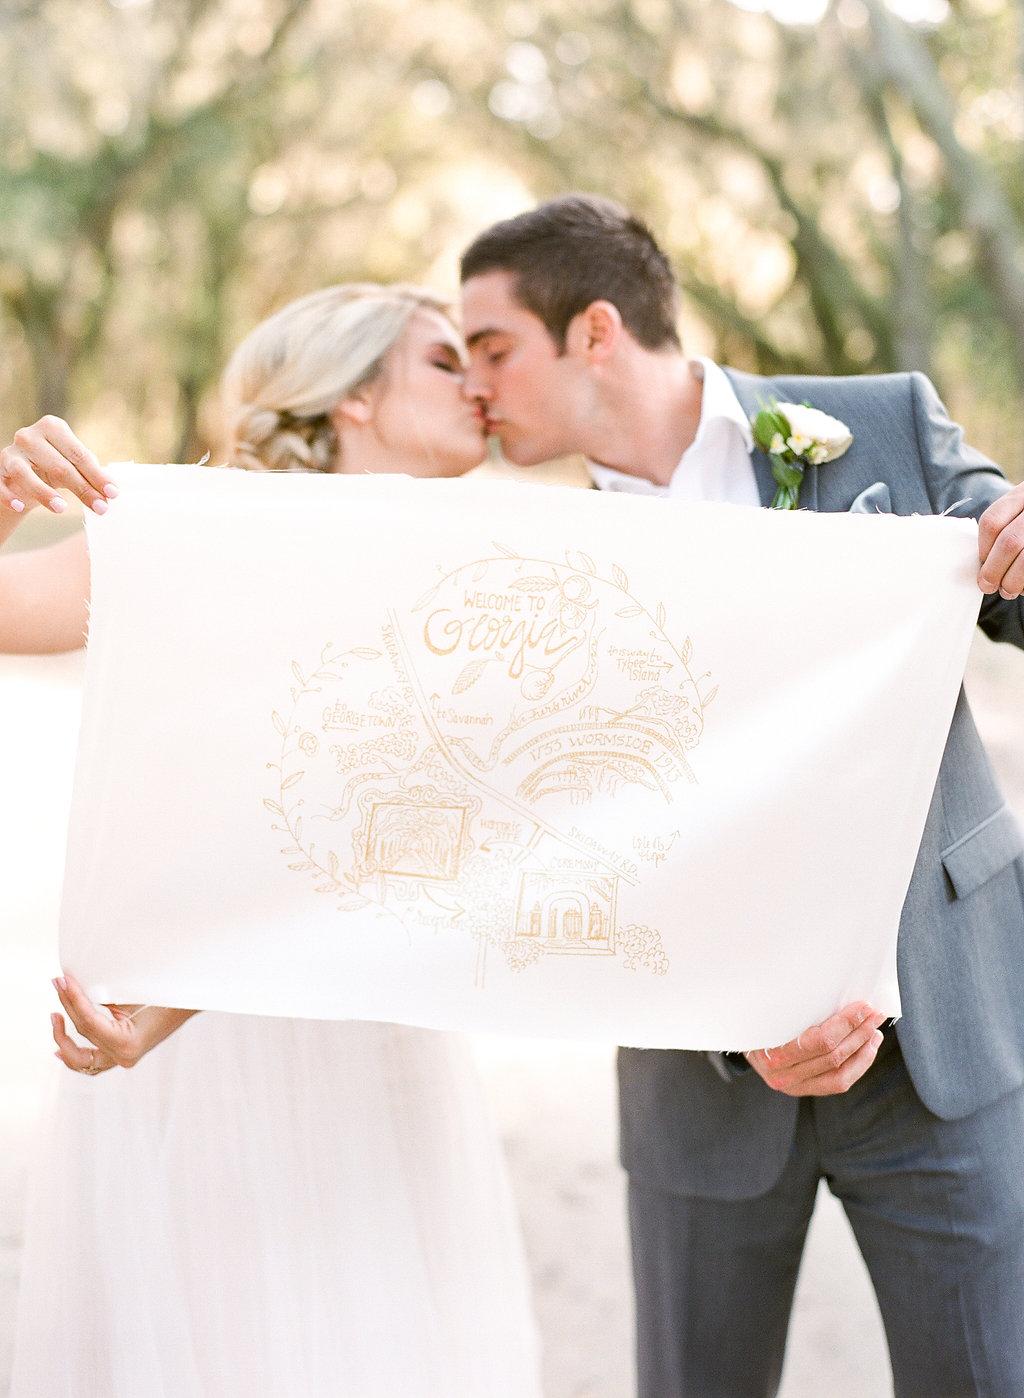 the-happy-bloom-wormsloe-wedding-savannah-wedding-ivory-and-beau-bridal-boutique-savannah-wedding-dresses-savannah-bridal-boutique-georgia-bridal-boutique-design-studio-south-sunset-wedding-blush-by-hayley-paige-candi-1550-blush-wedding-dress-11.jpg